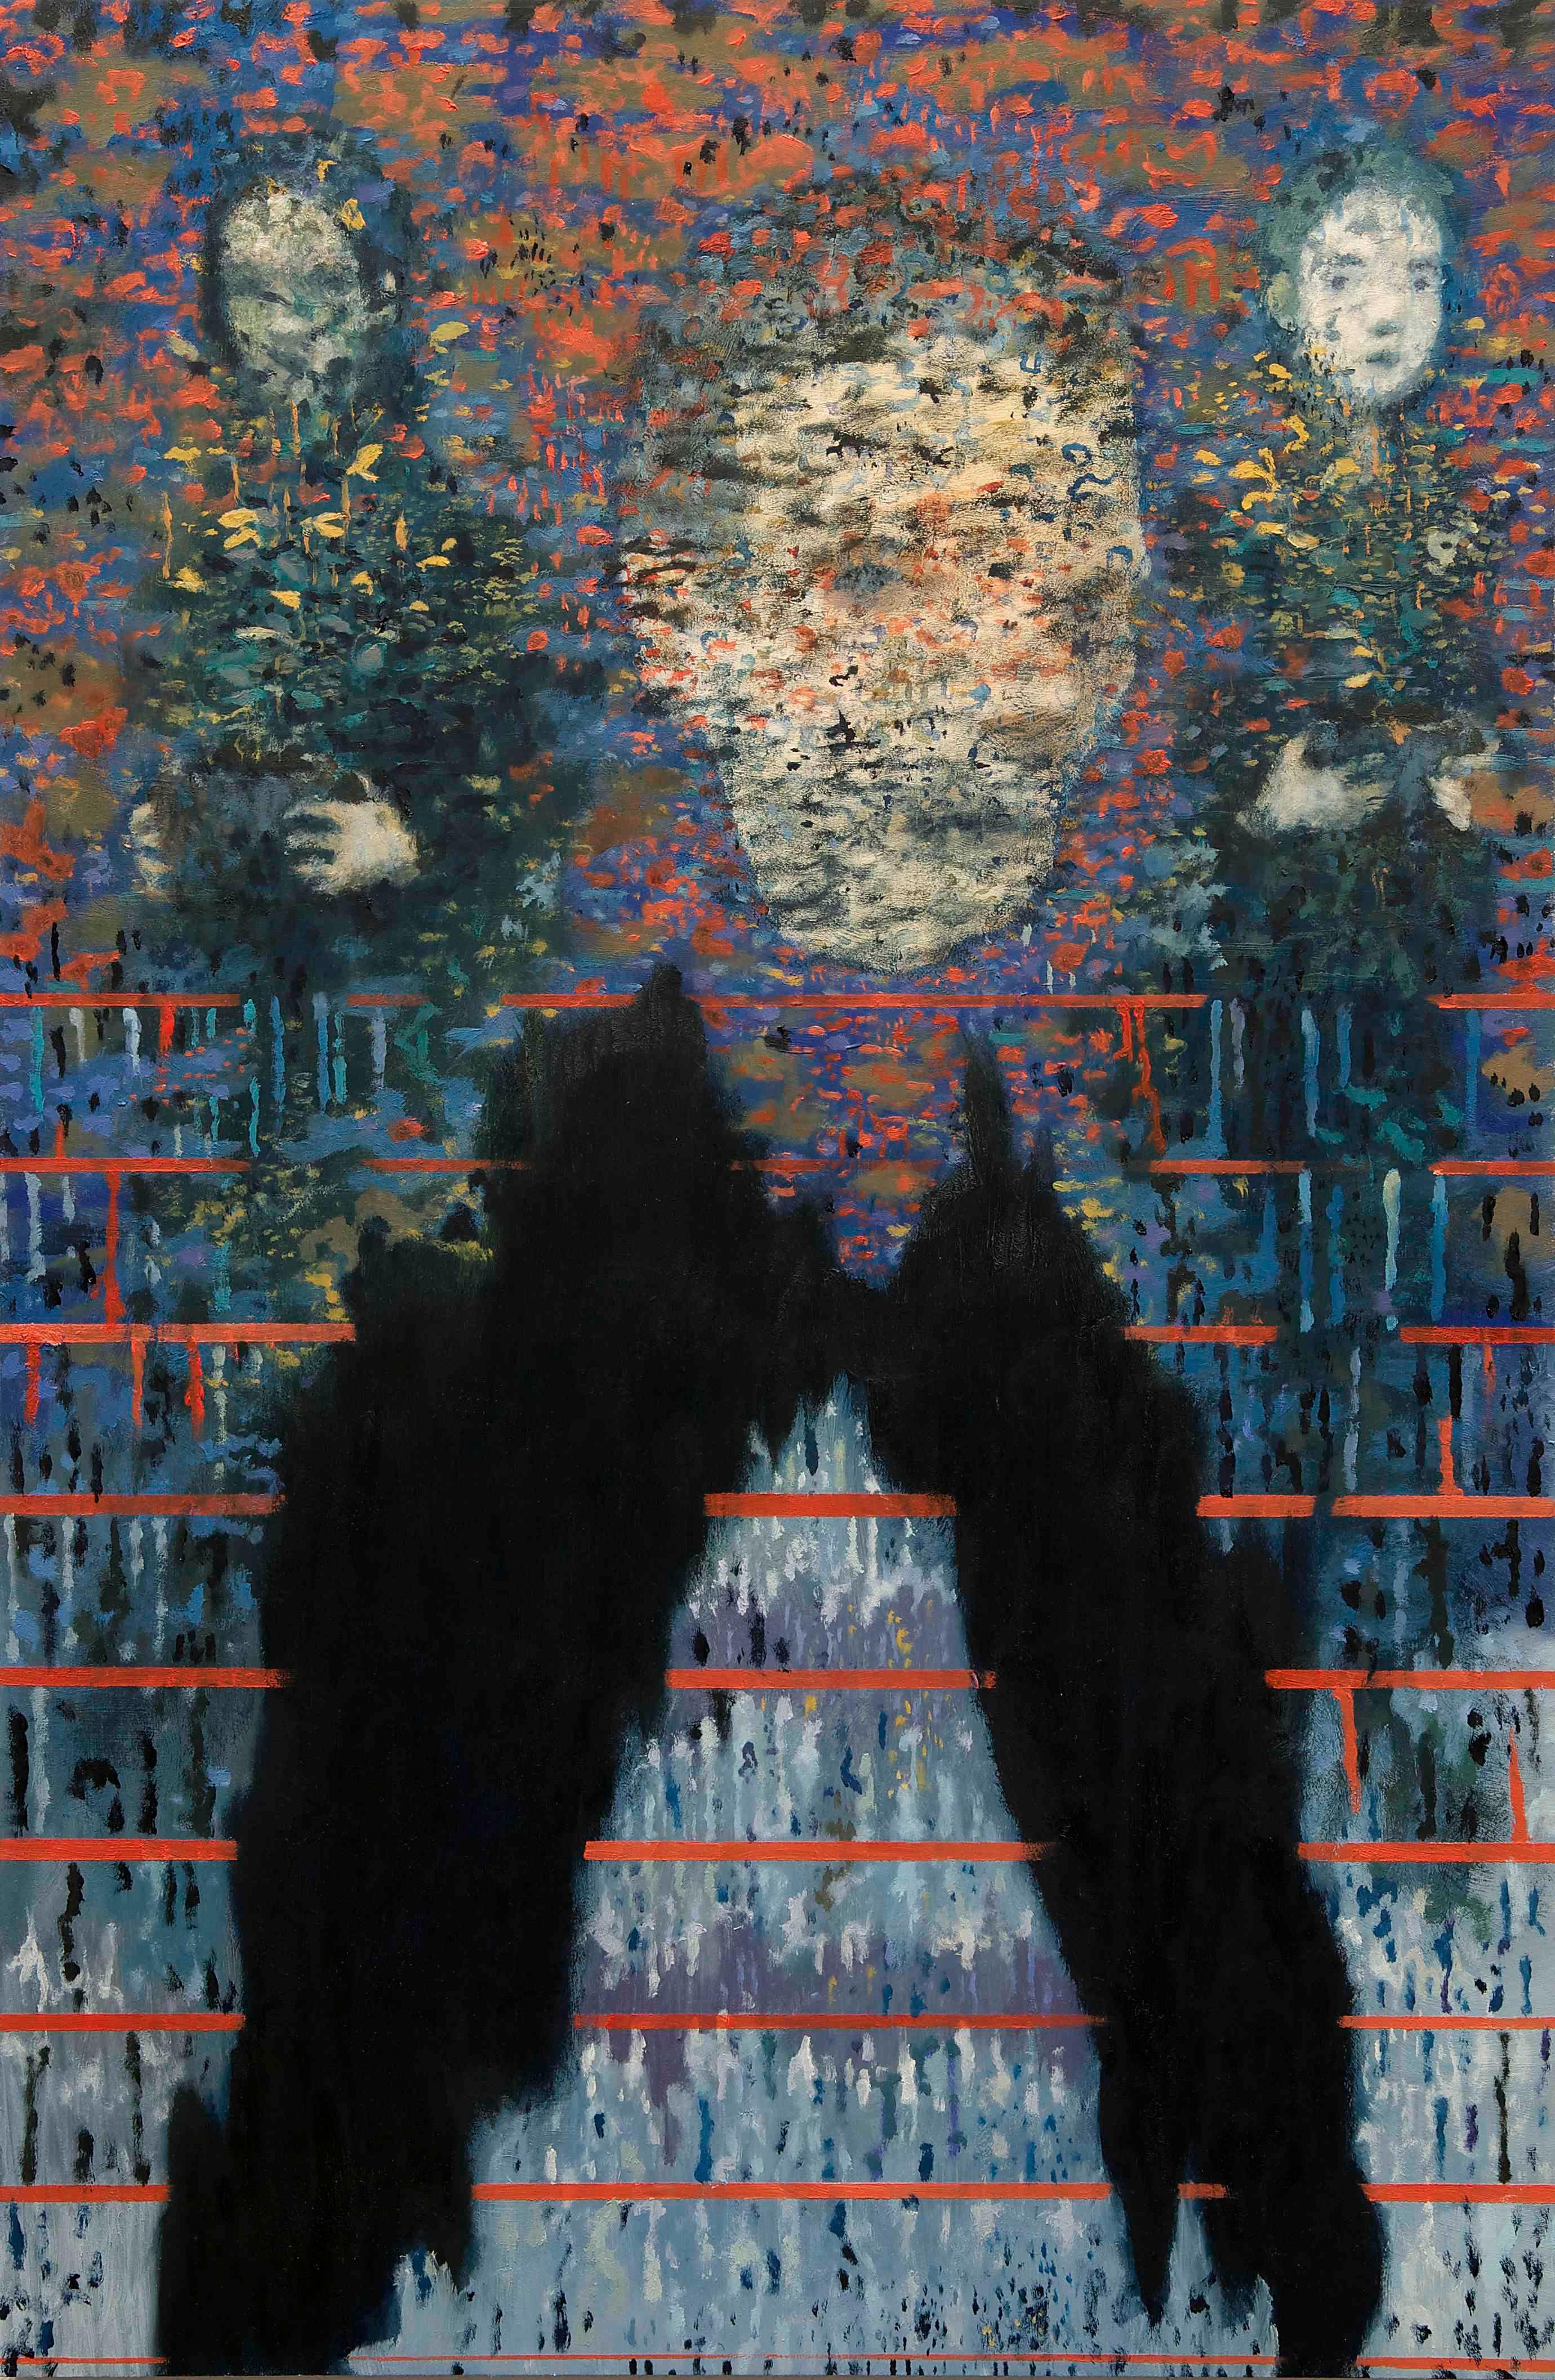 Others Will See | Óleo sobre aluminio | 38 x 25 cm |2014-2015